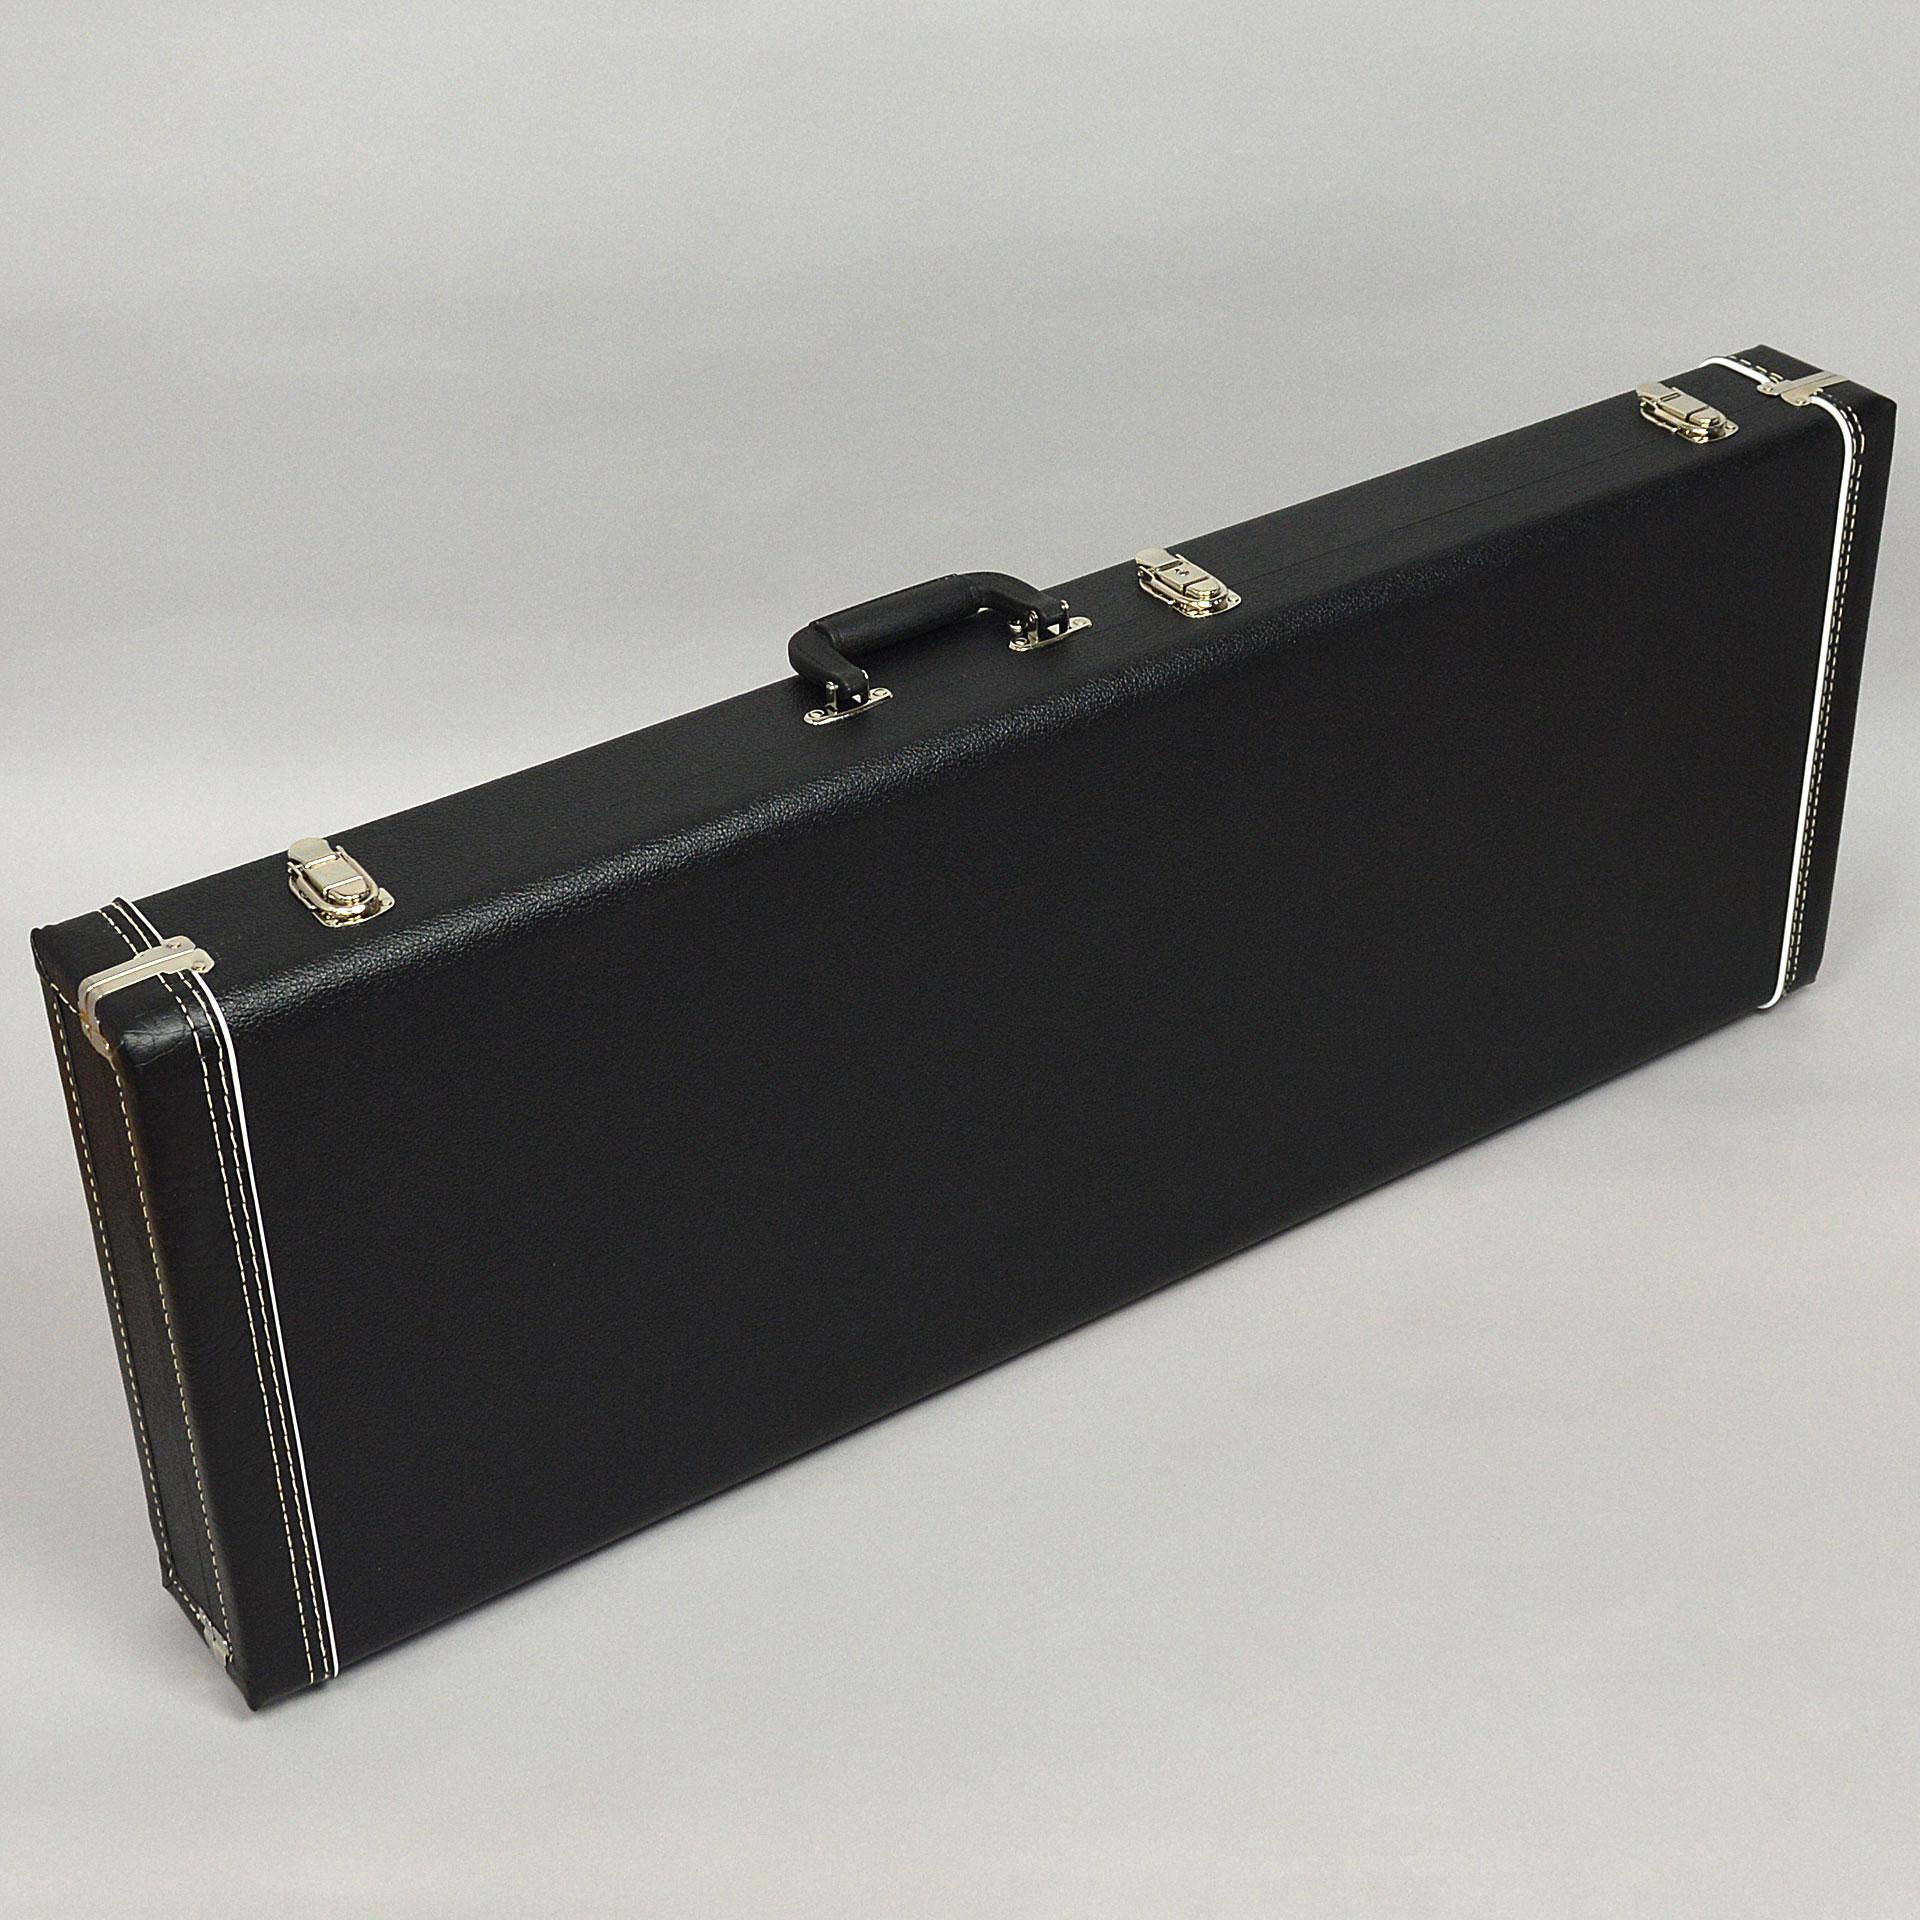 Custom 24 10-Top Flame Maple PRのケース・その他画像